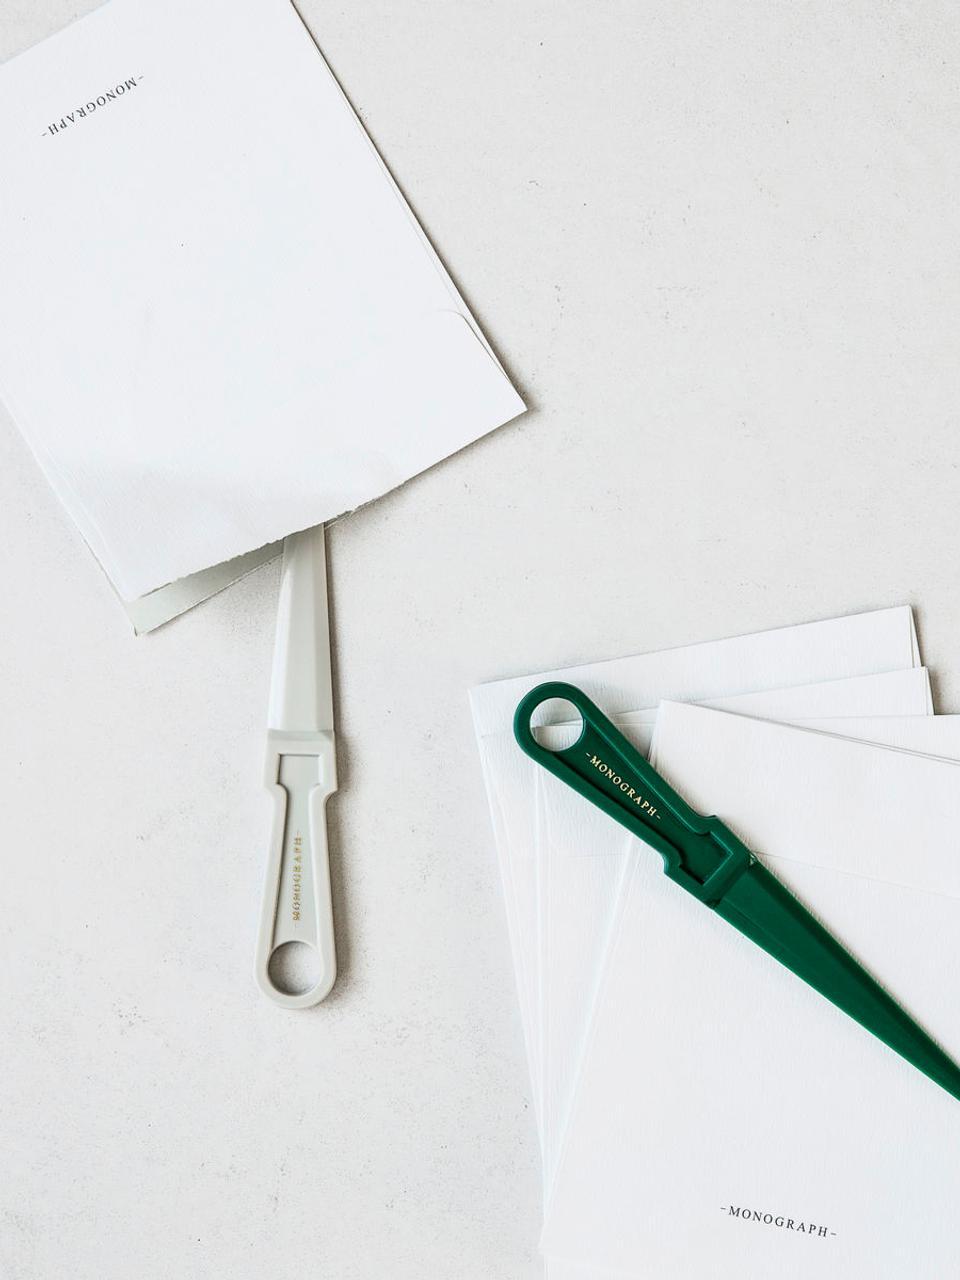 Tagliacarte Ligra, Materiale sintetico, Grigio chiaro, Larg. 3 x Alt. 17 cm